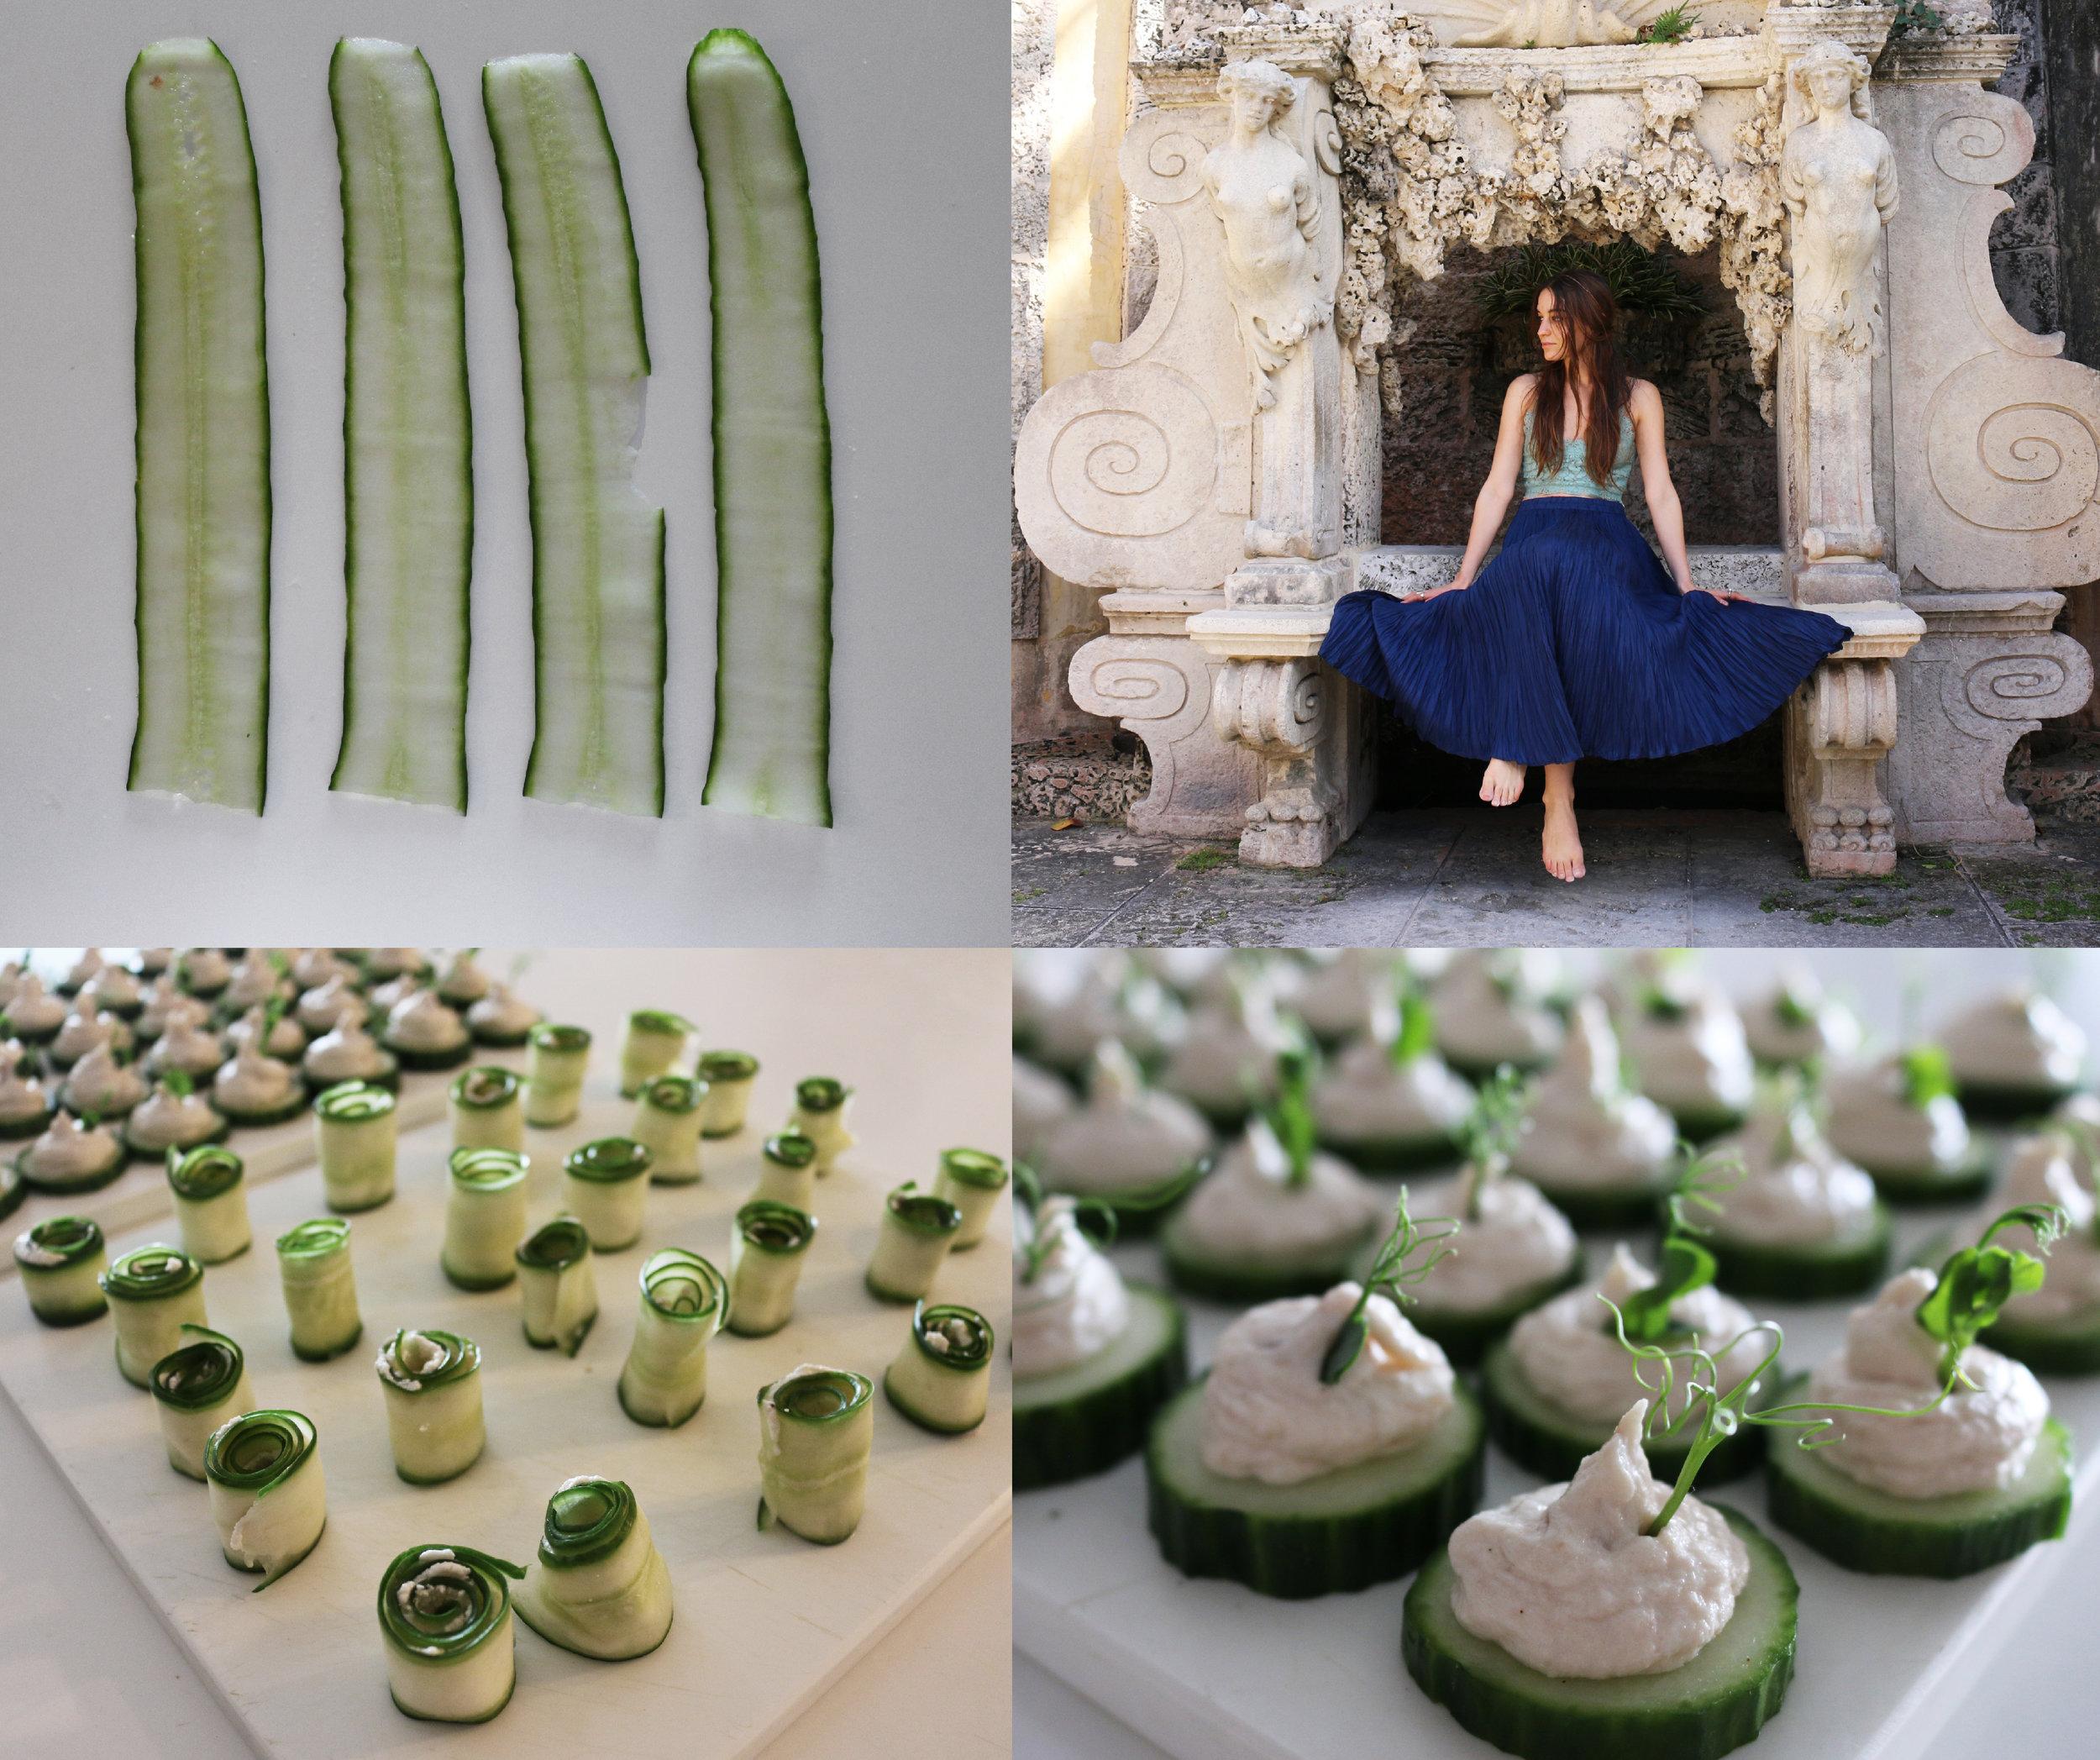 Cucumber-rolls-white-fish-bites-culinarywitch